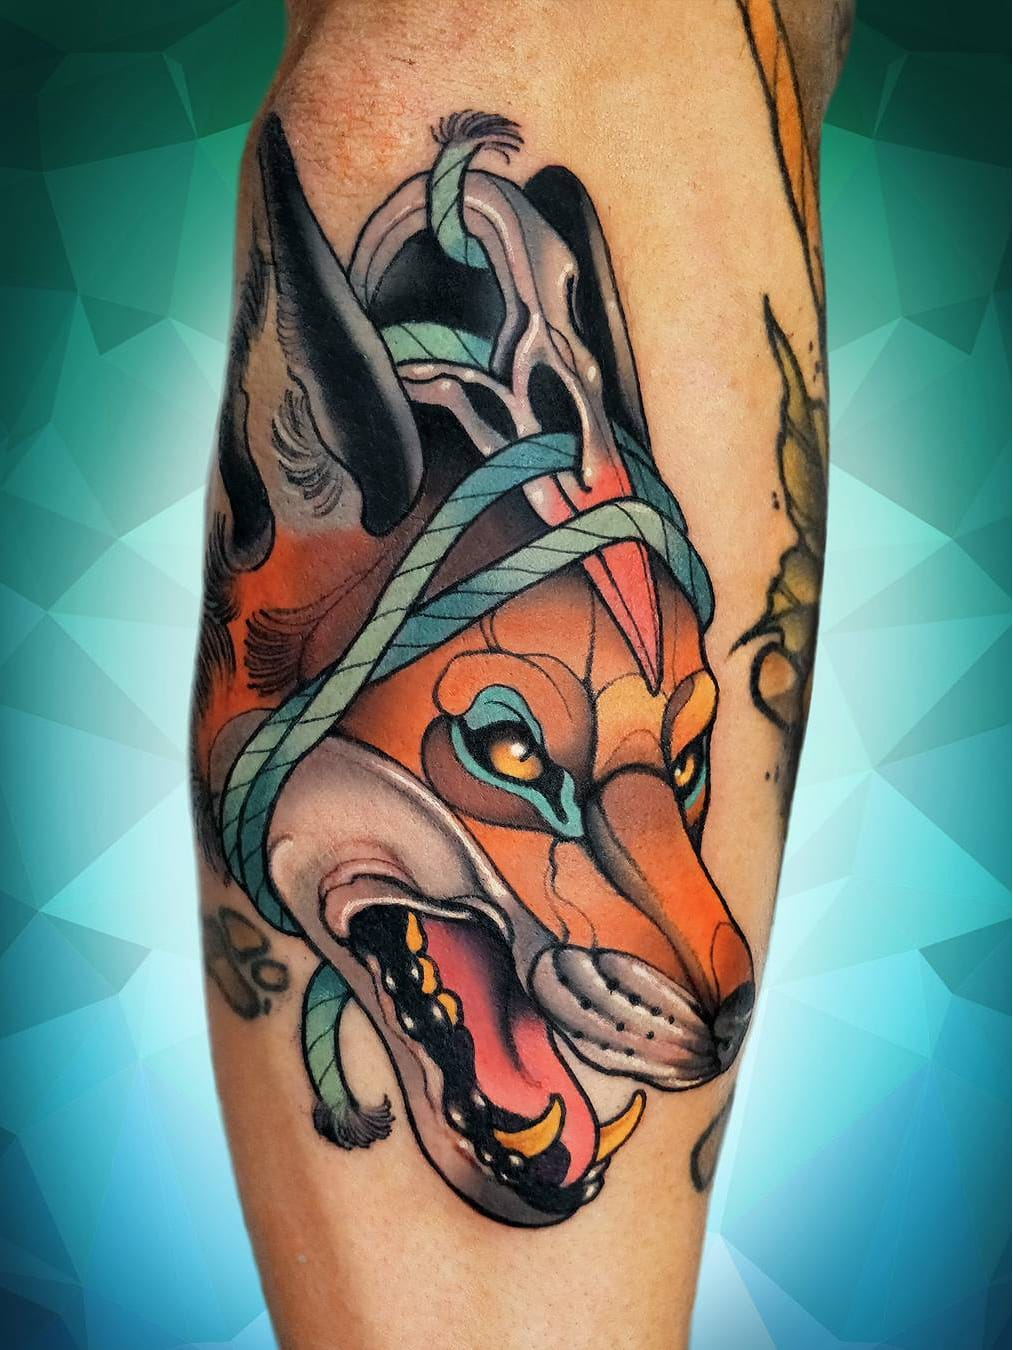 #NiktheRookie #gringo #neotraditional #neotrad #colorido #colorful #lobo #wolf #raposa #fox